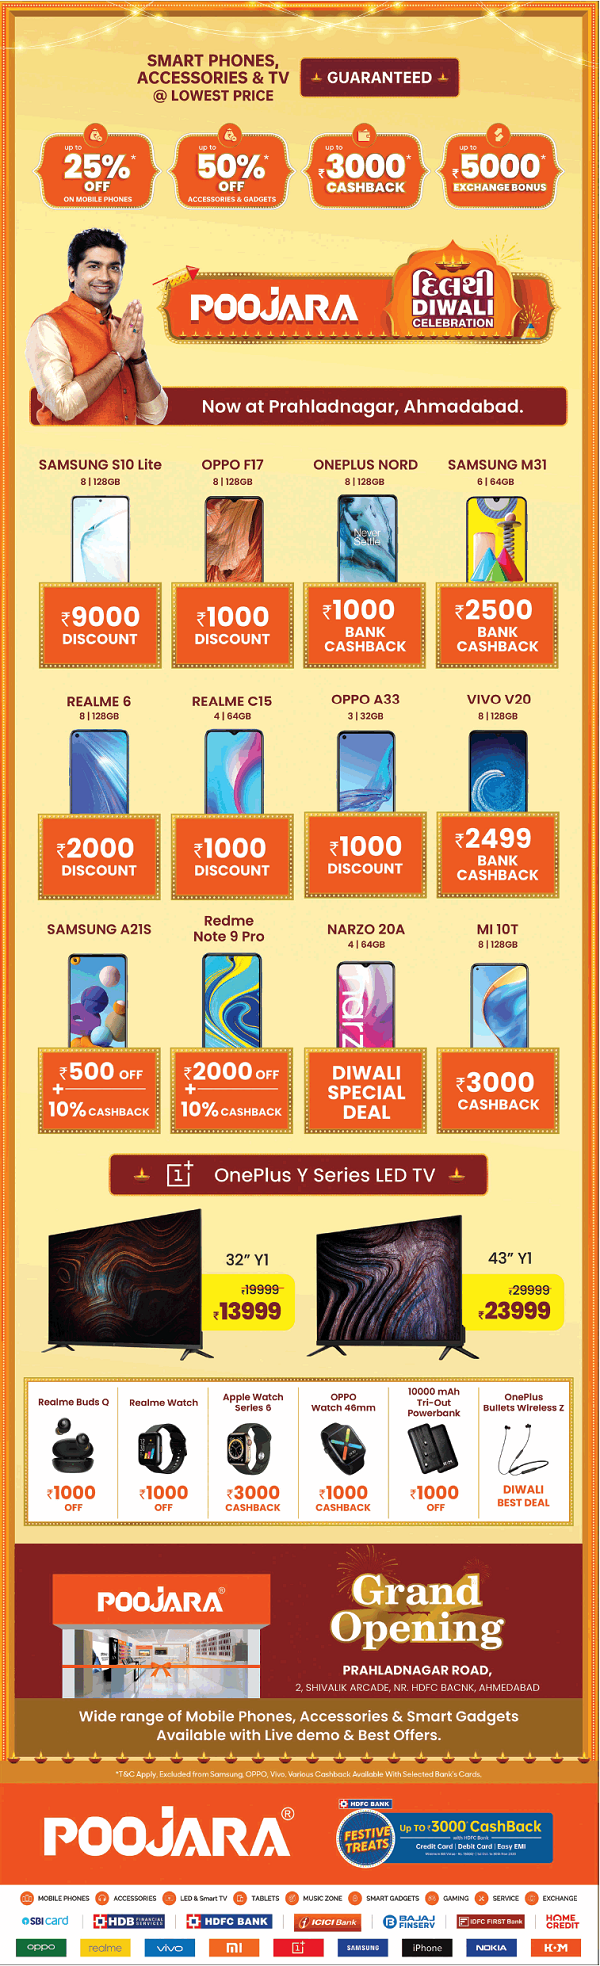 Poojara offers India